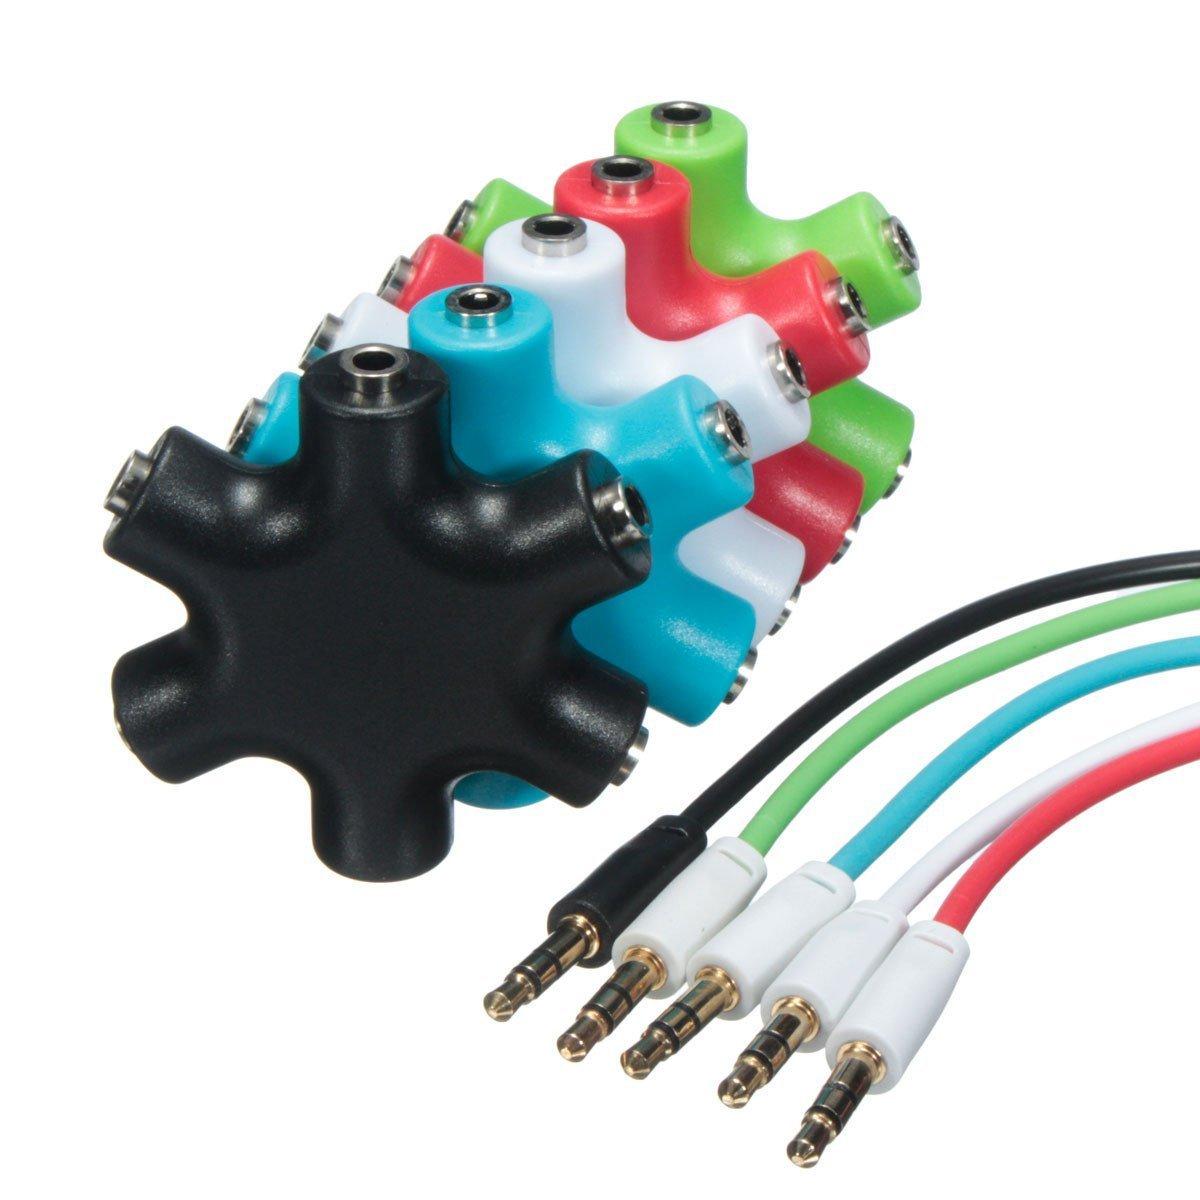 Cheap 3 5mm Bulk Headphone Splitter Find 6 Way Ports Male To 5 Female Audio Earphone 35mm Jack Adapter Get Quotations Random Color 1 2 4